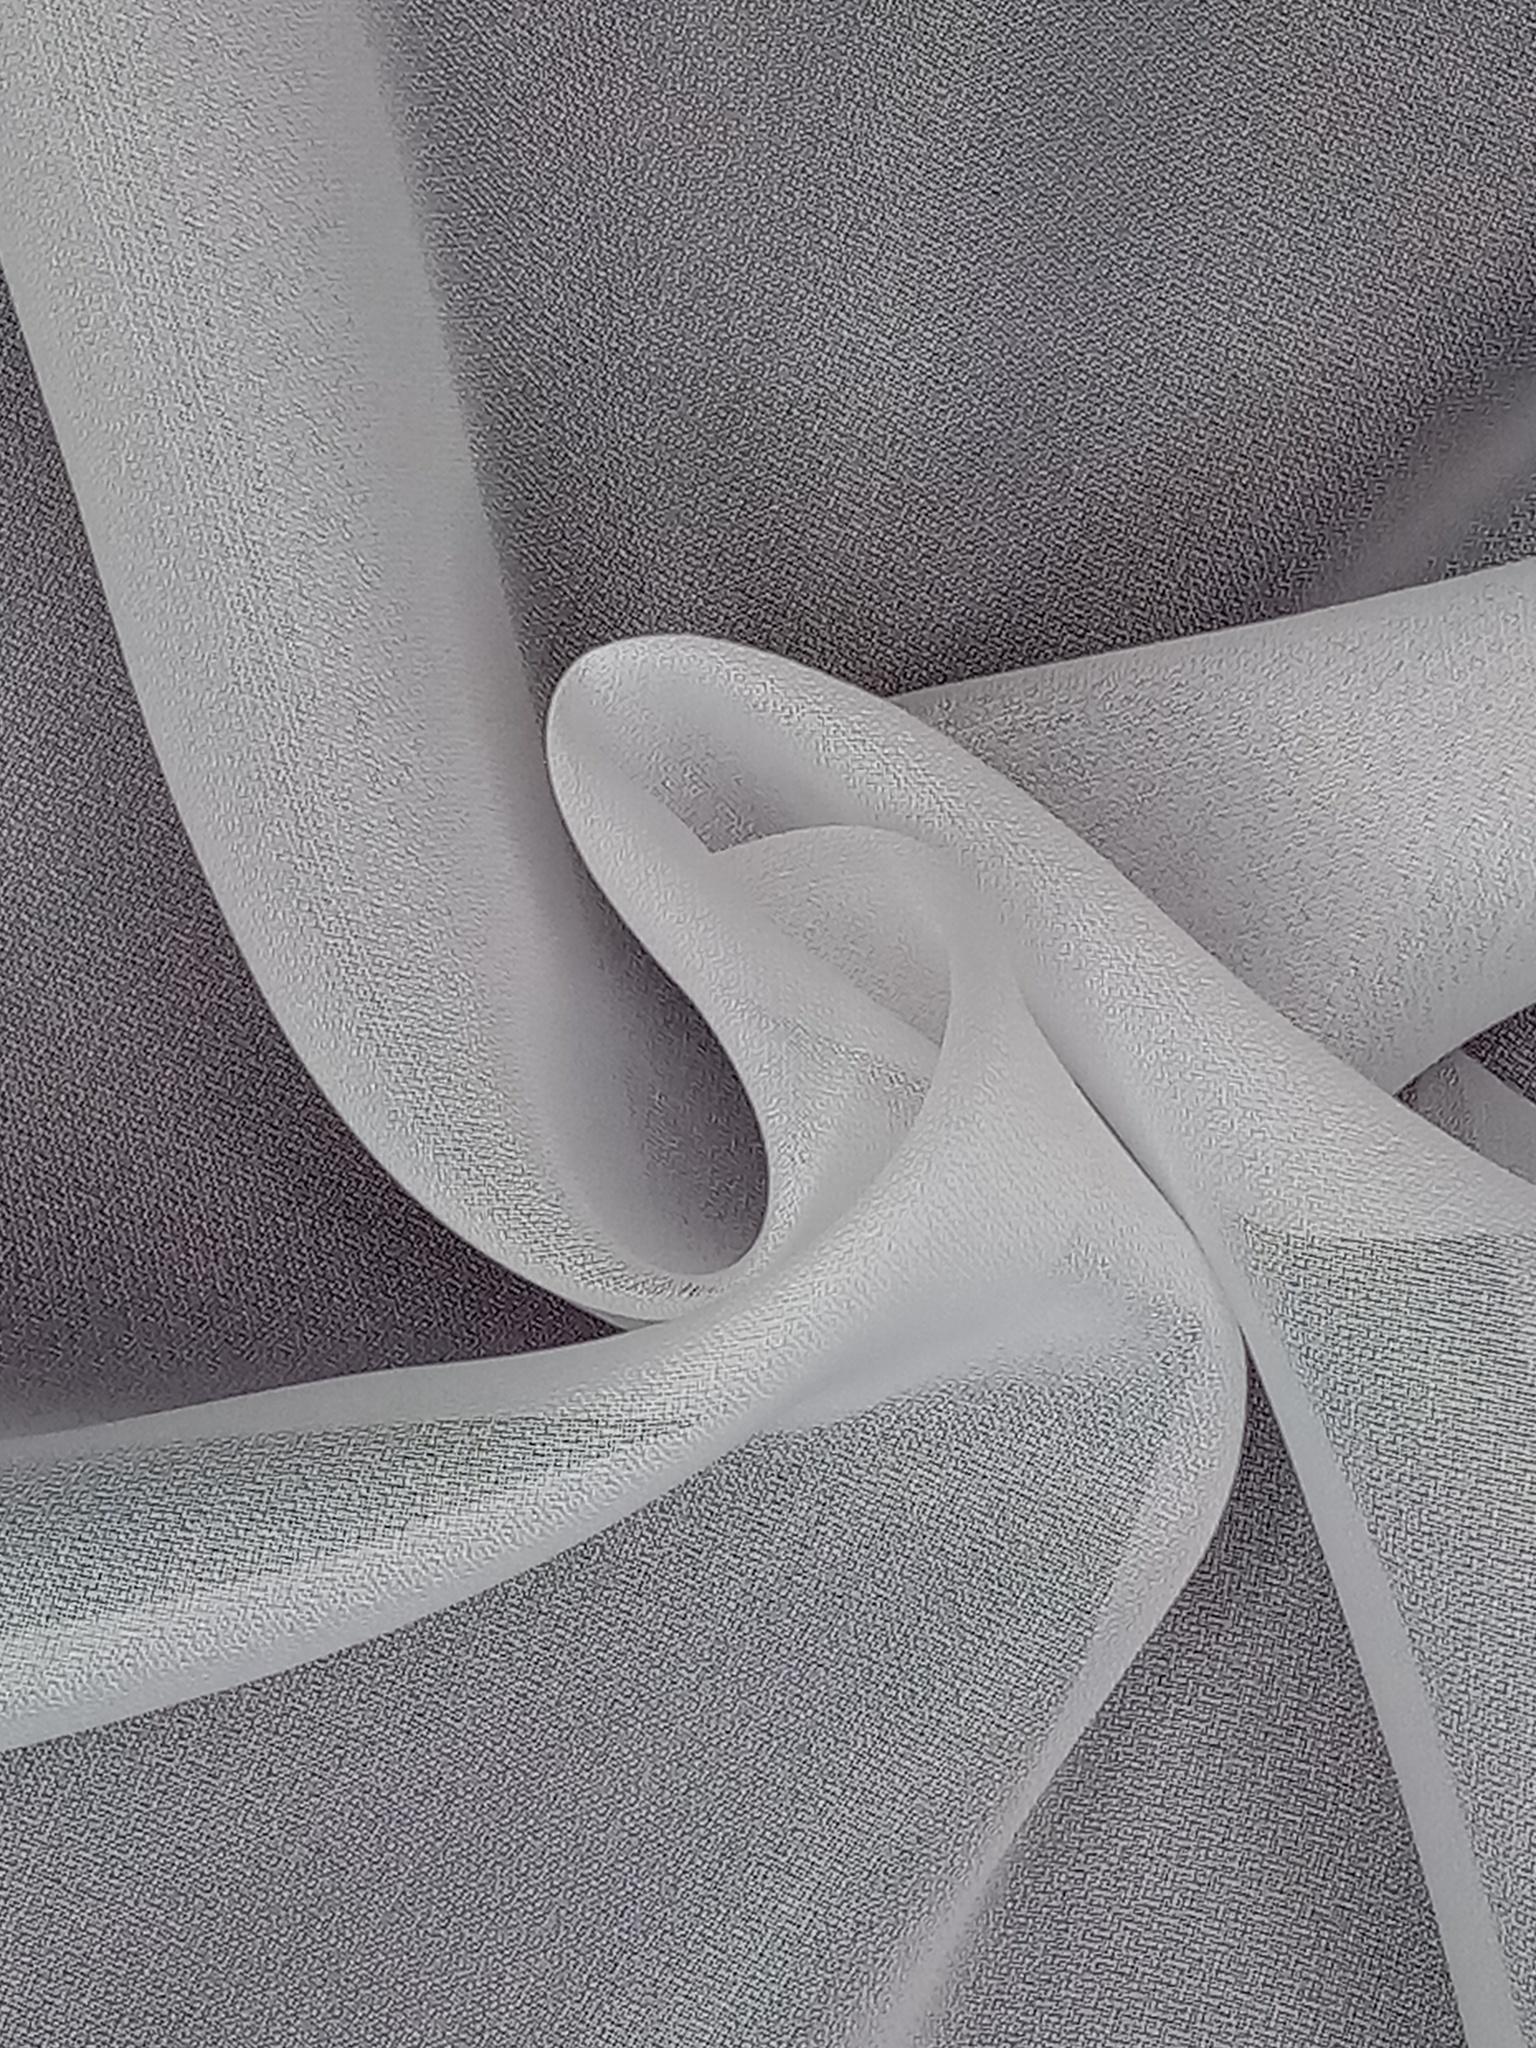 Тюль креп с утяжелителем Белый